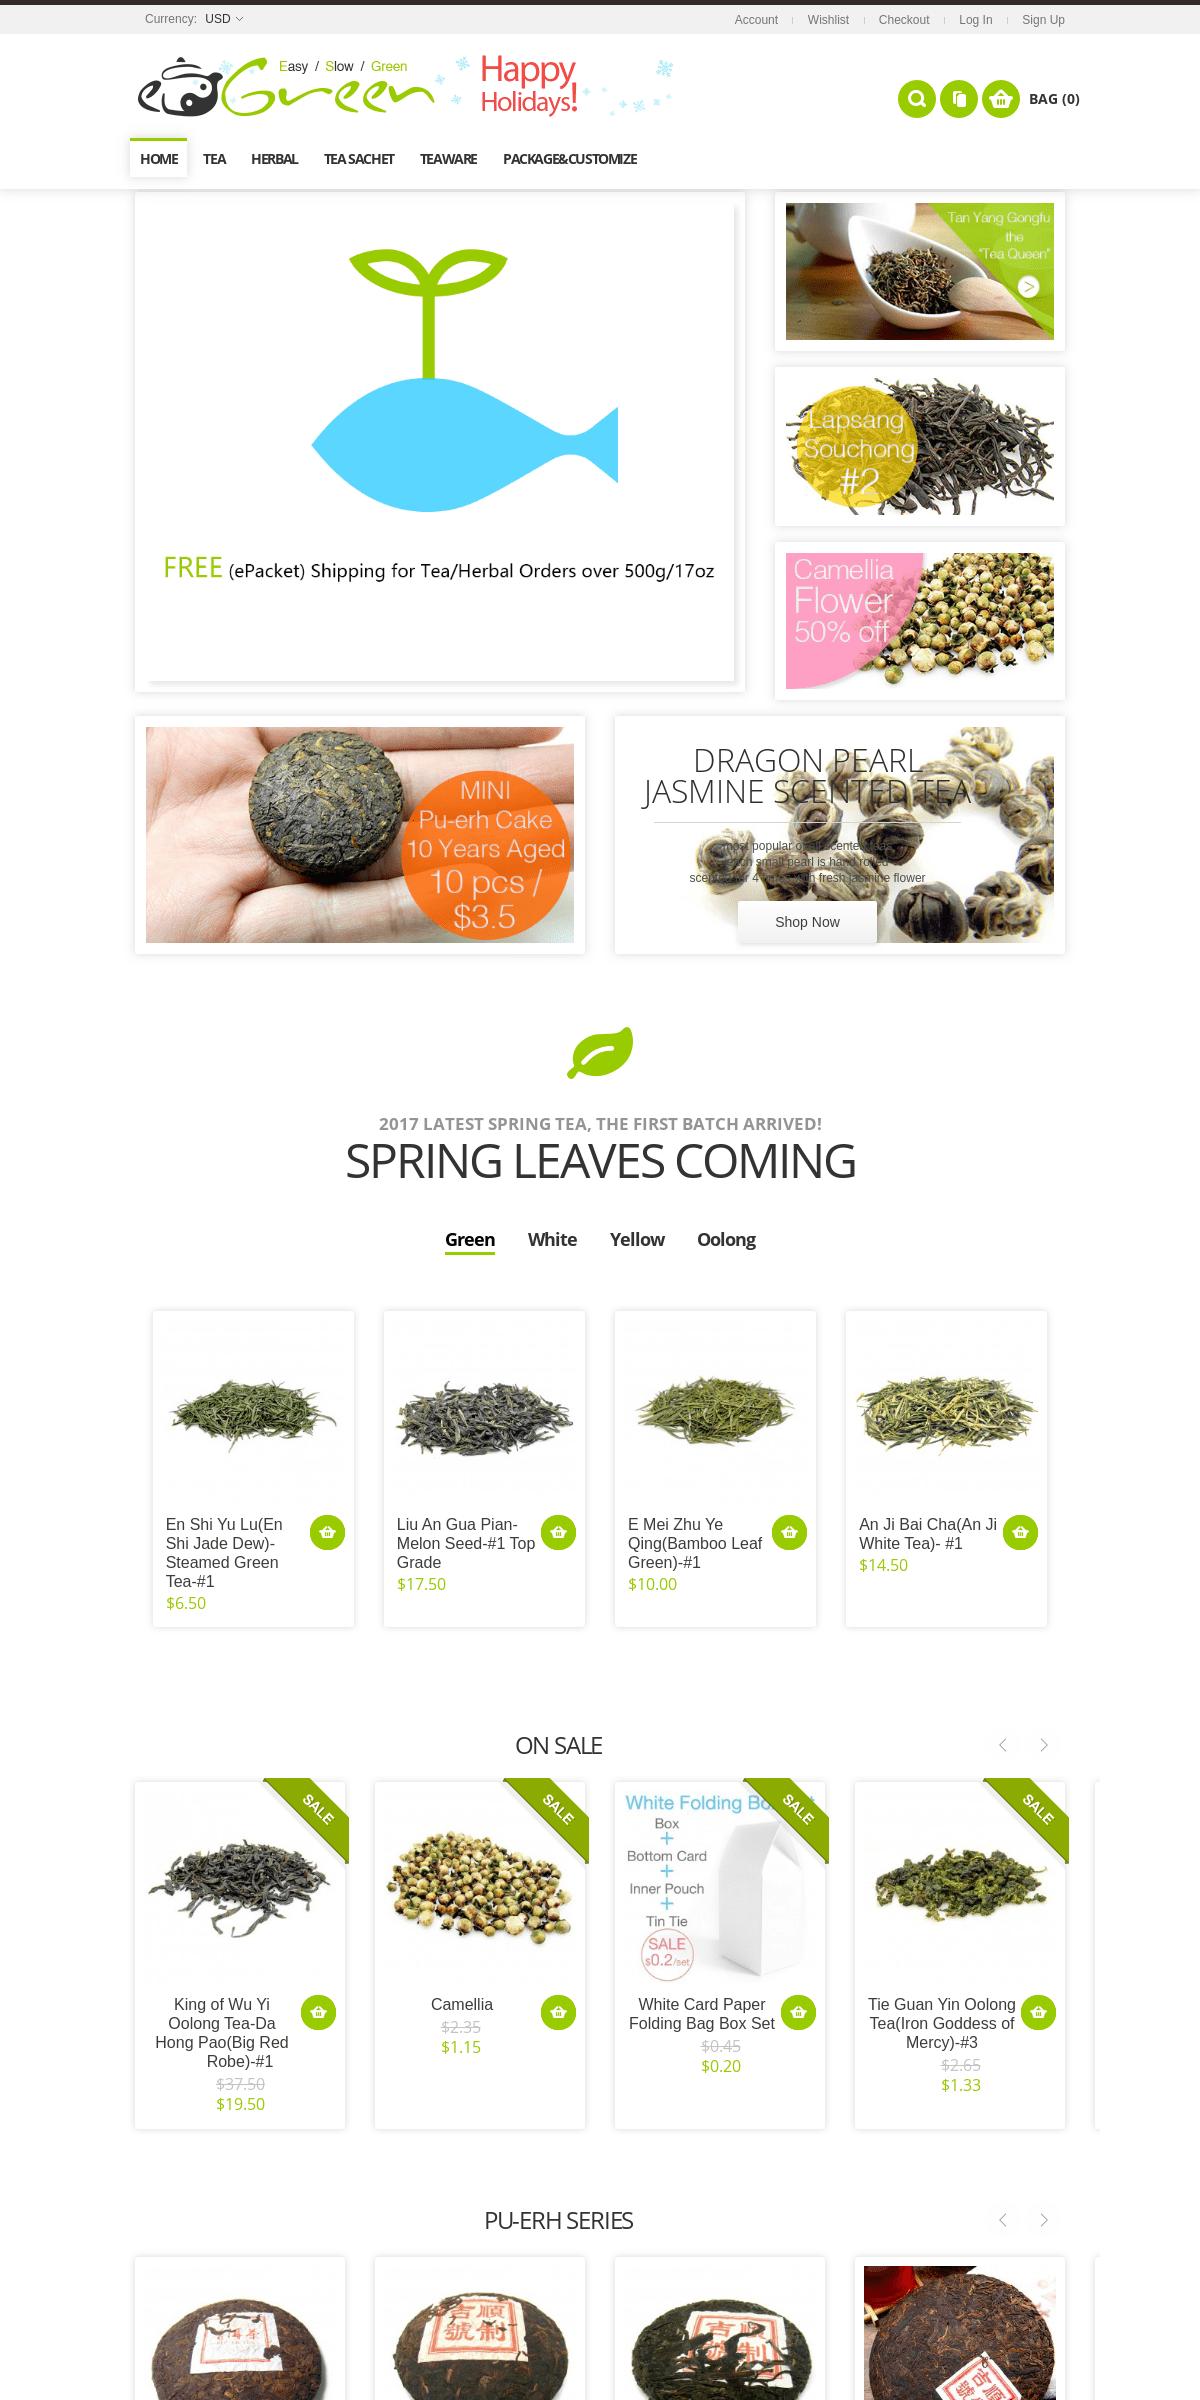 Loose Leaf Chinese Tea, Herbs and Elegant Tea-wares - ESGREEN ESGREEN-Enjoy - Slow - Green